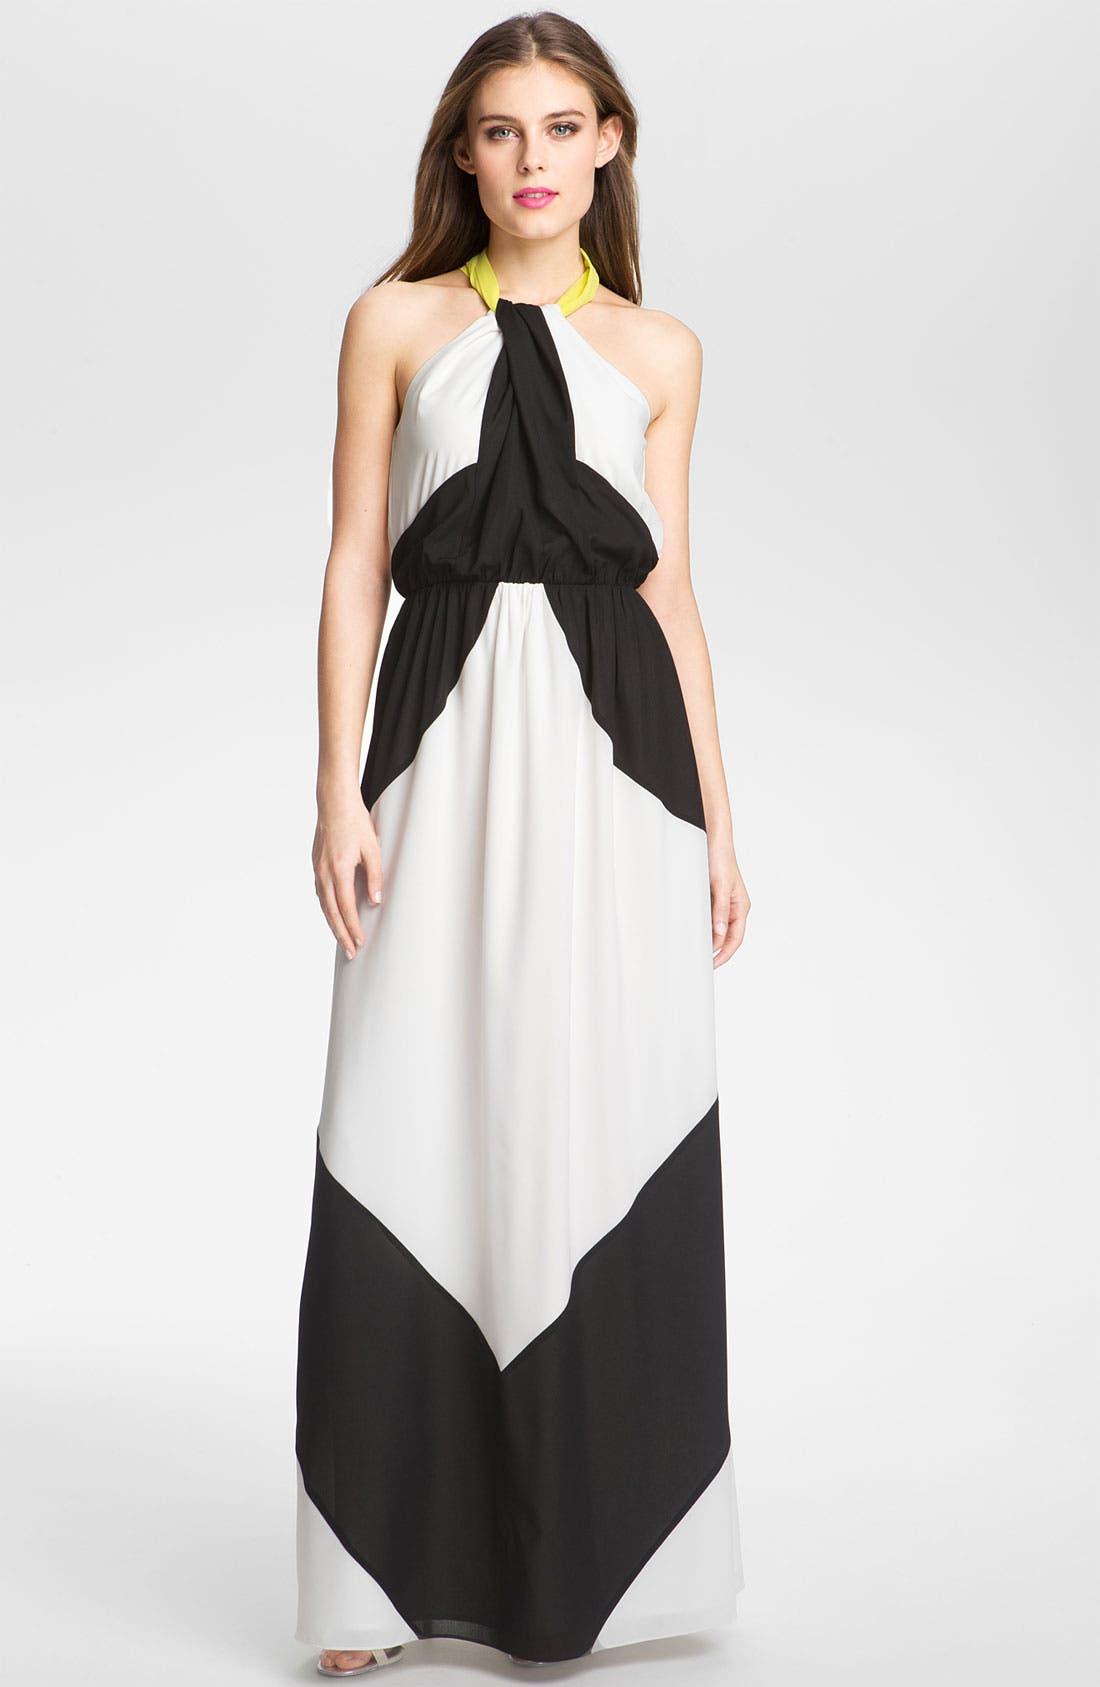 Alternate Image 1 Selected - Vince Camuto Colorblocked Chiffon Maxi Dress